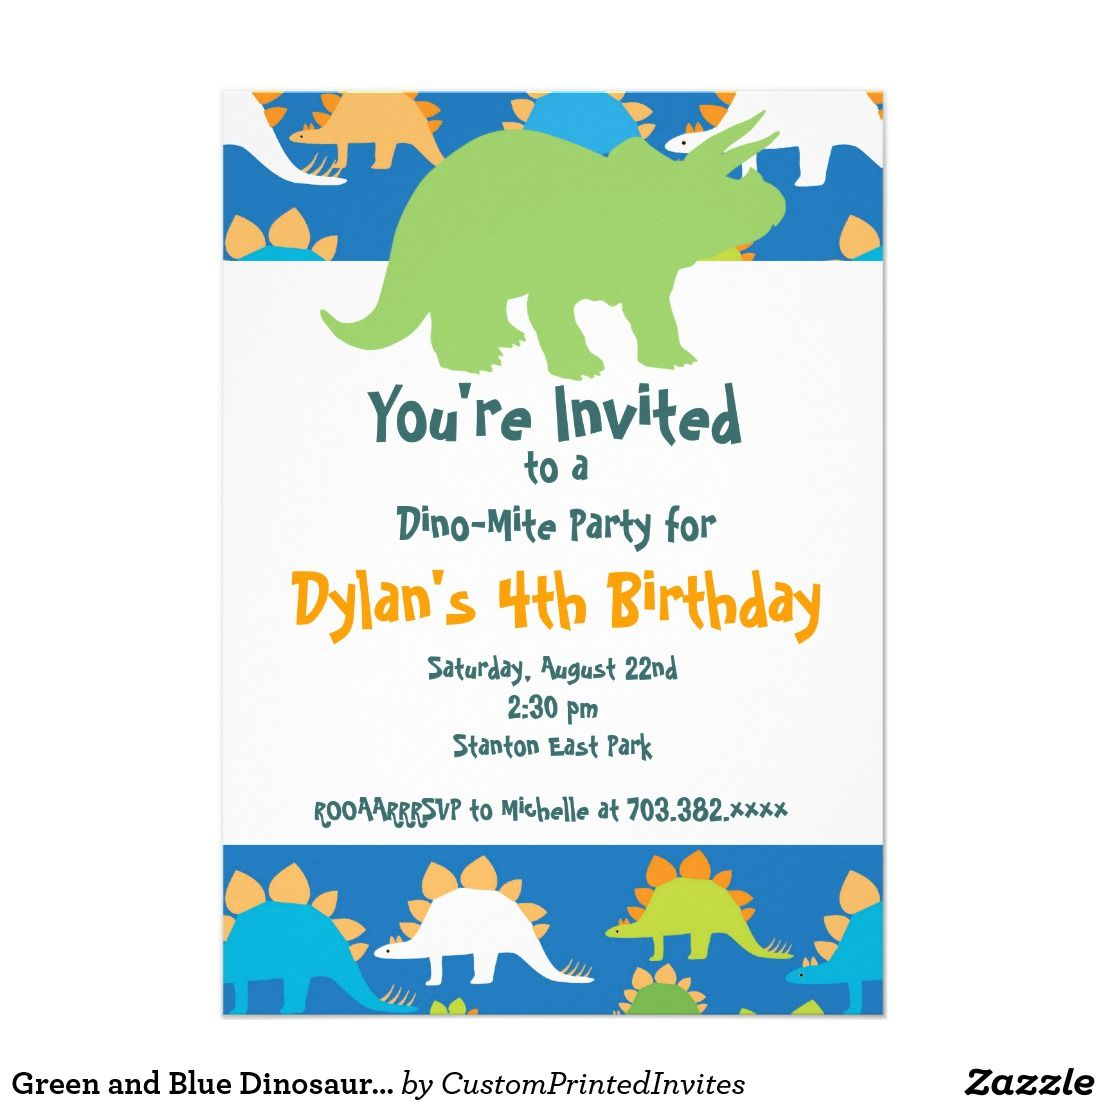 Green and Blue Dinosaur Birthday Party Invitations | Pinterest ...